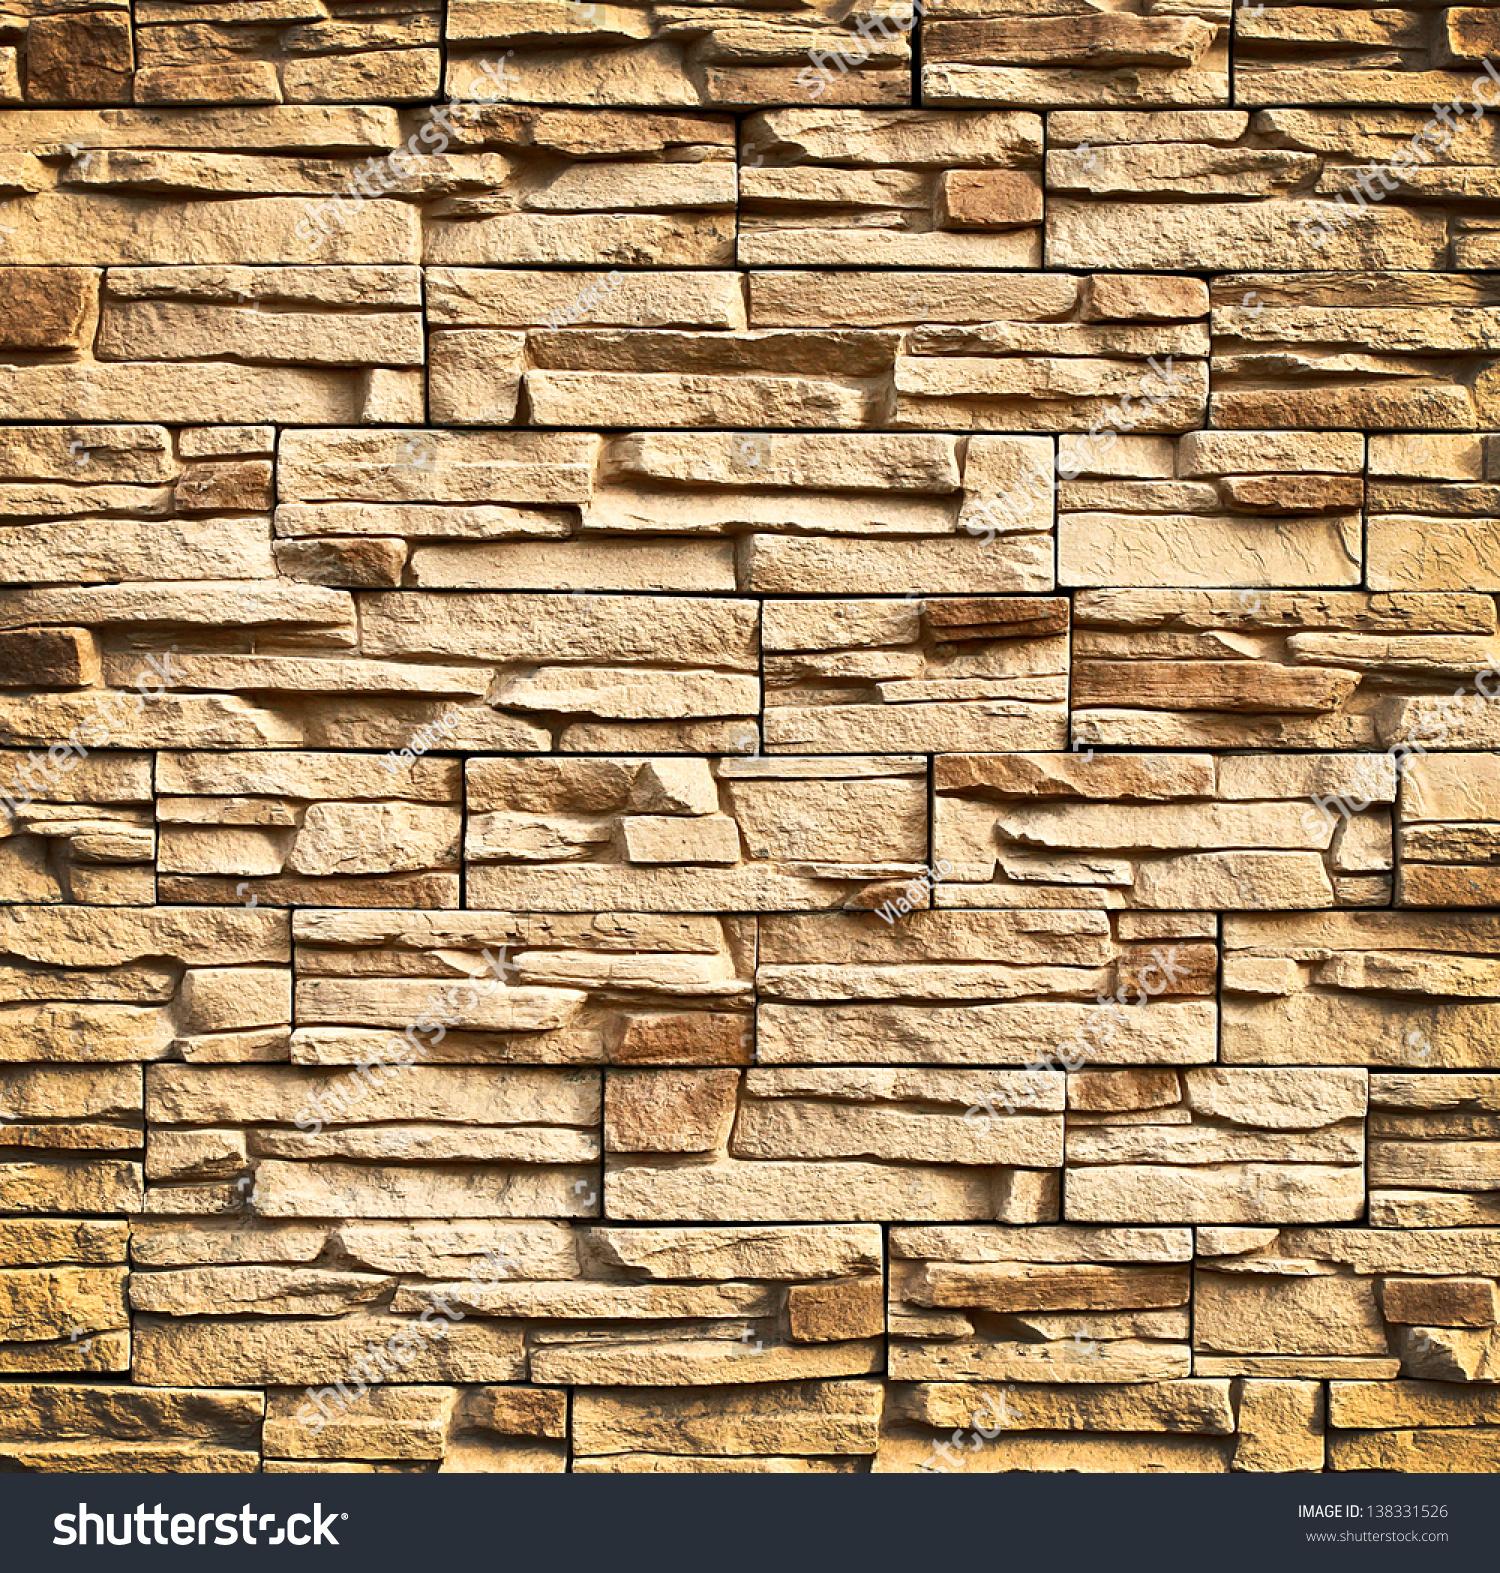 Photo image bricks brick masonry bricks wall background texture - Image Gallery Interior Stone Wall Texture